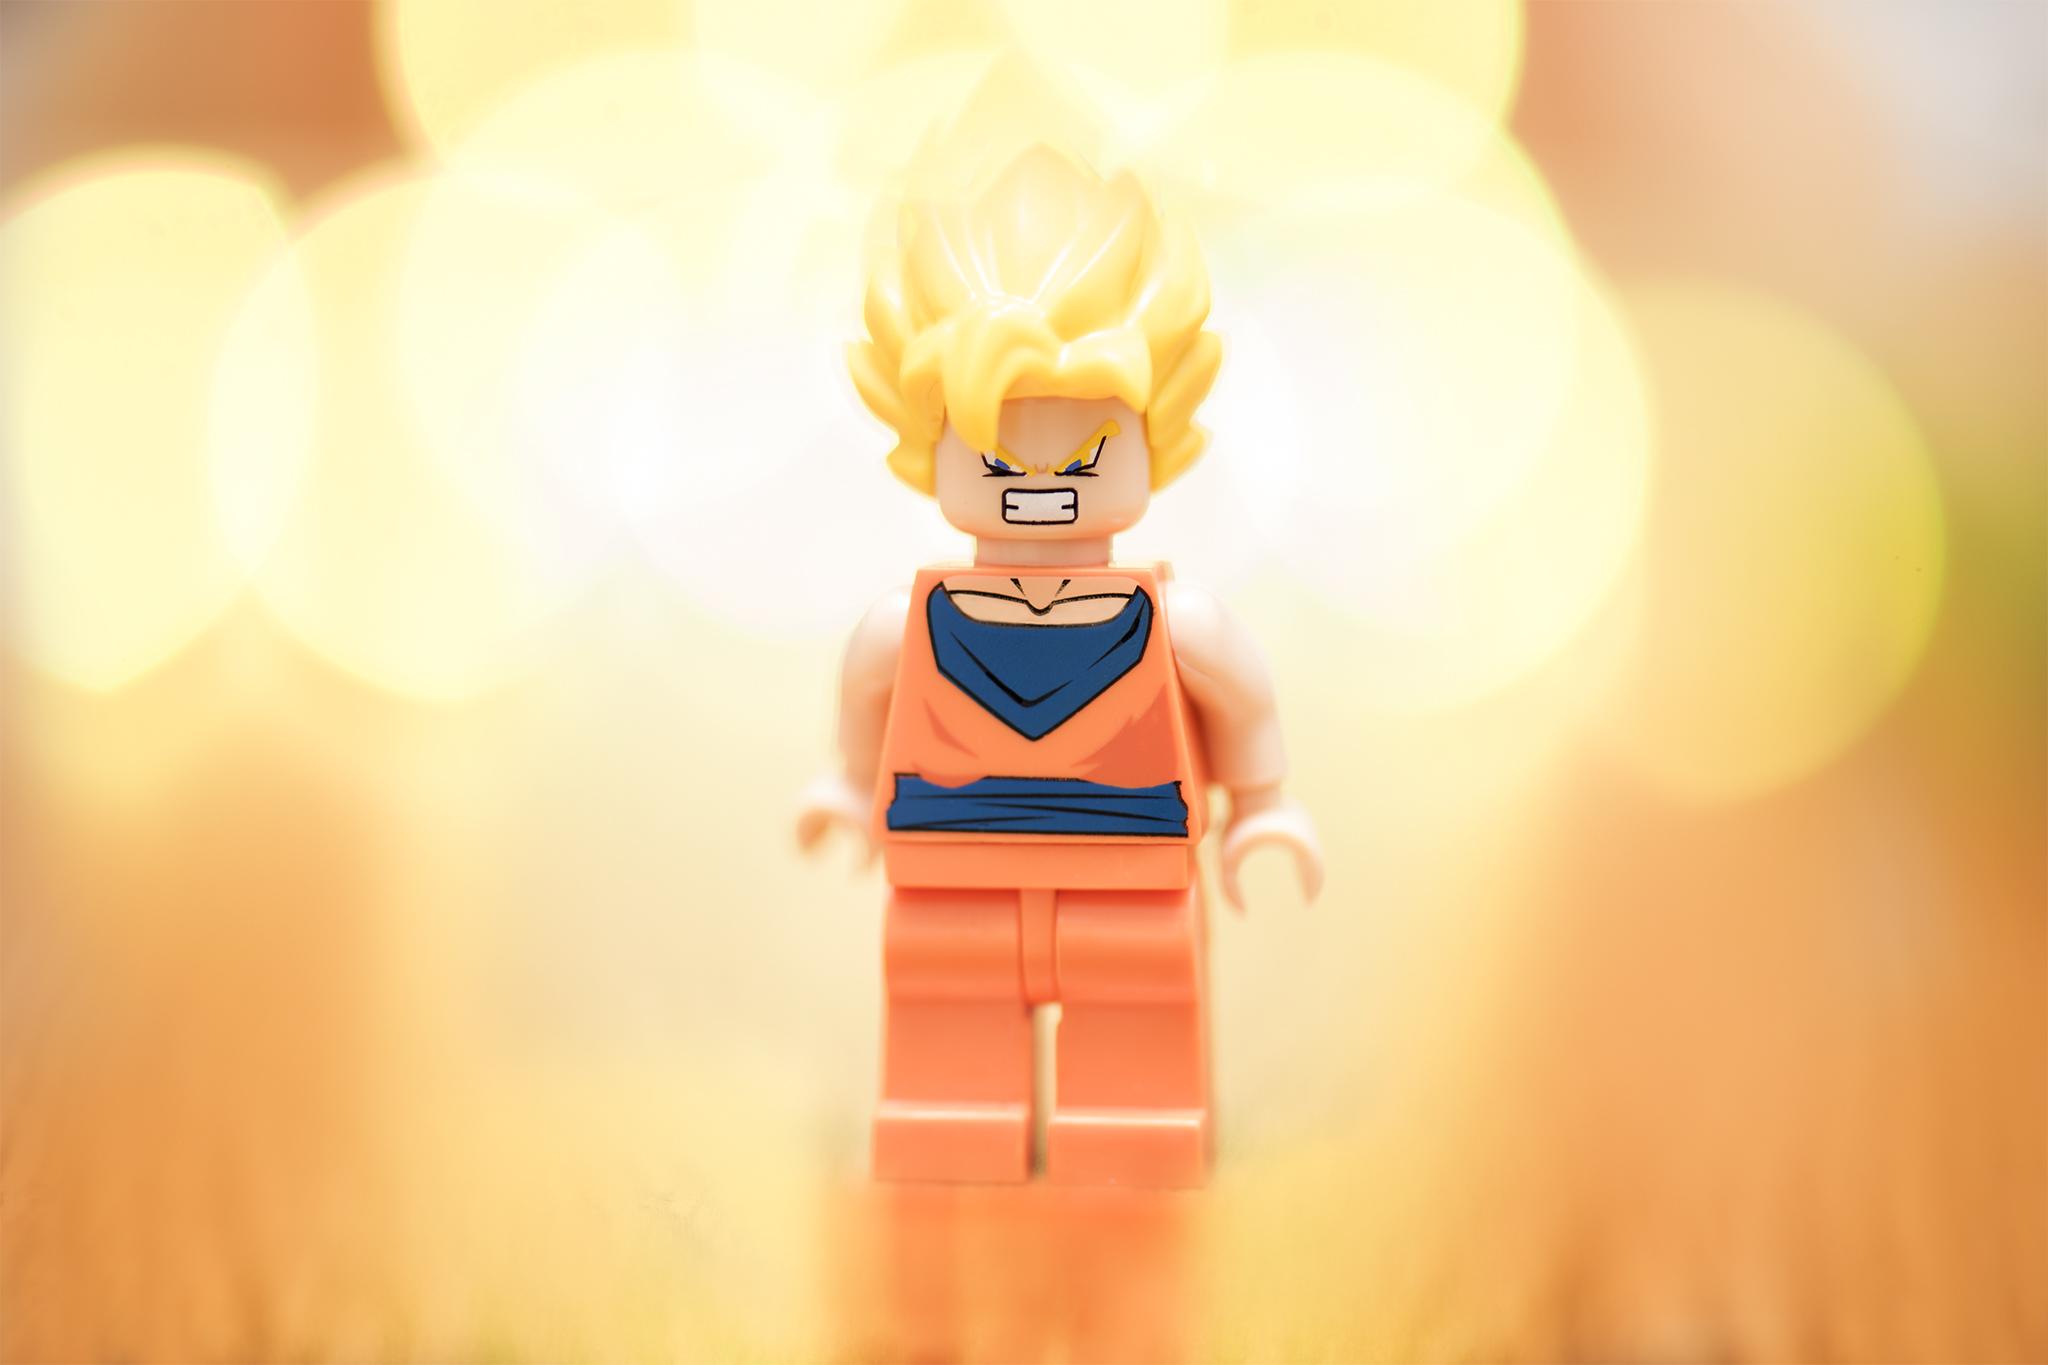 LEGO Goku going super saiyan!